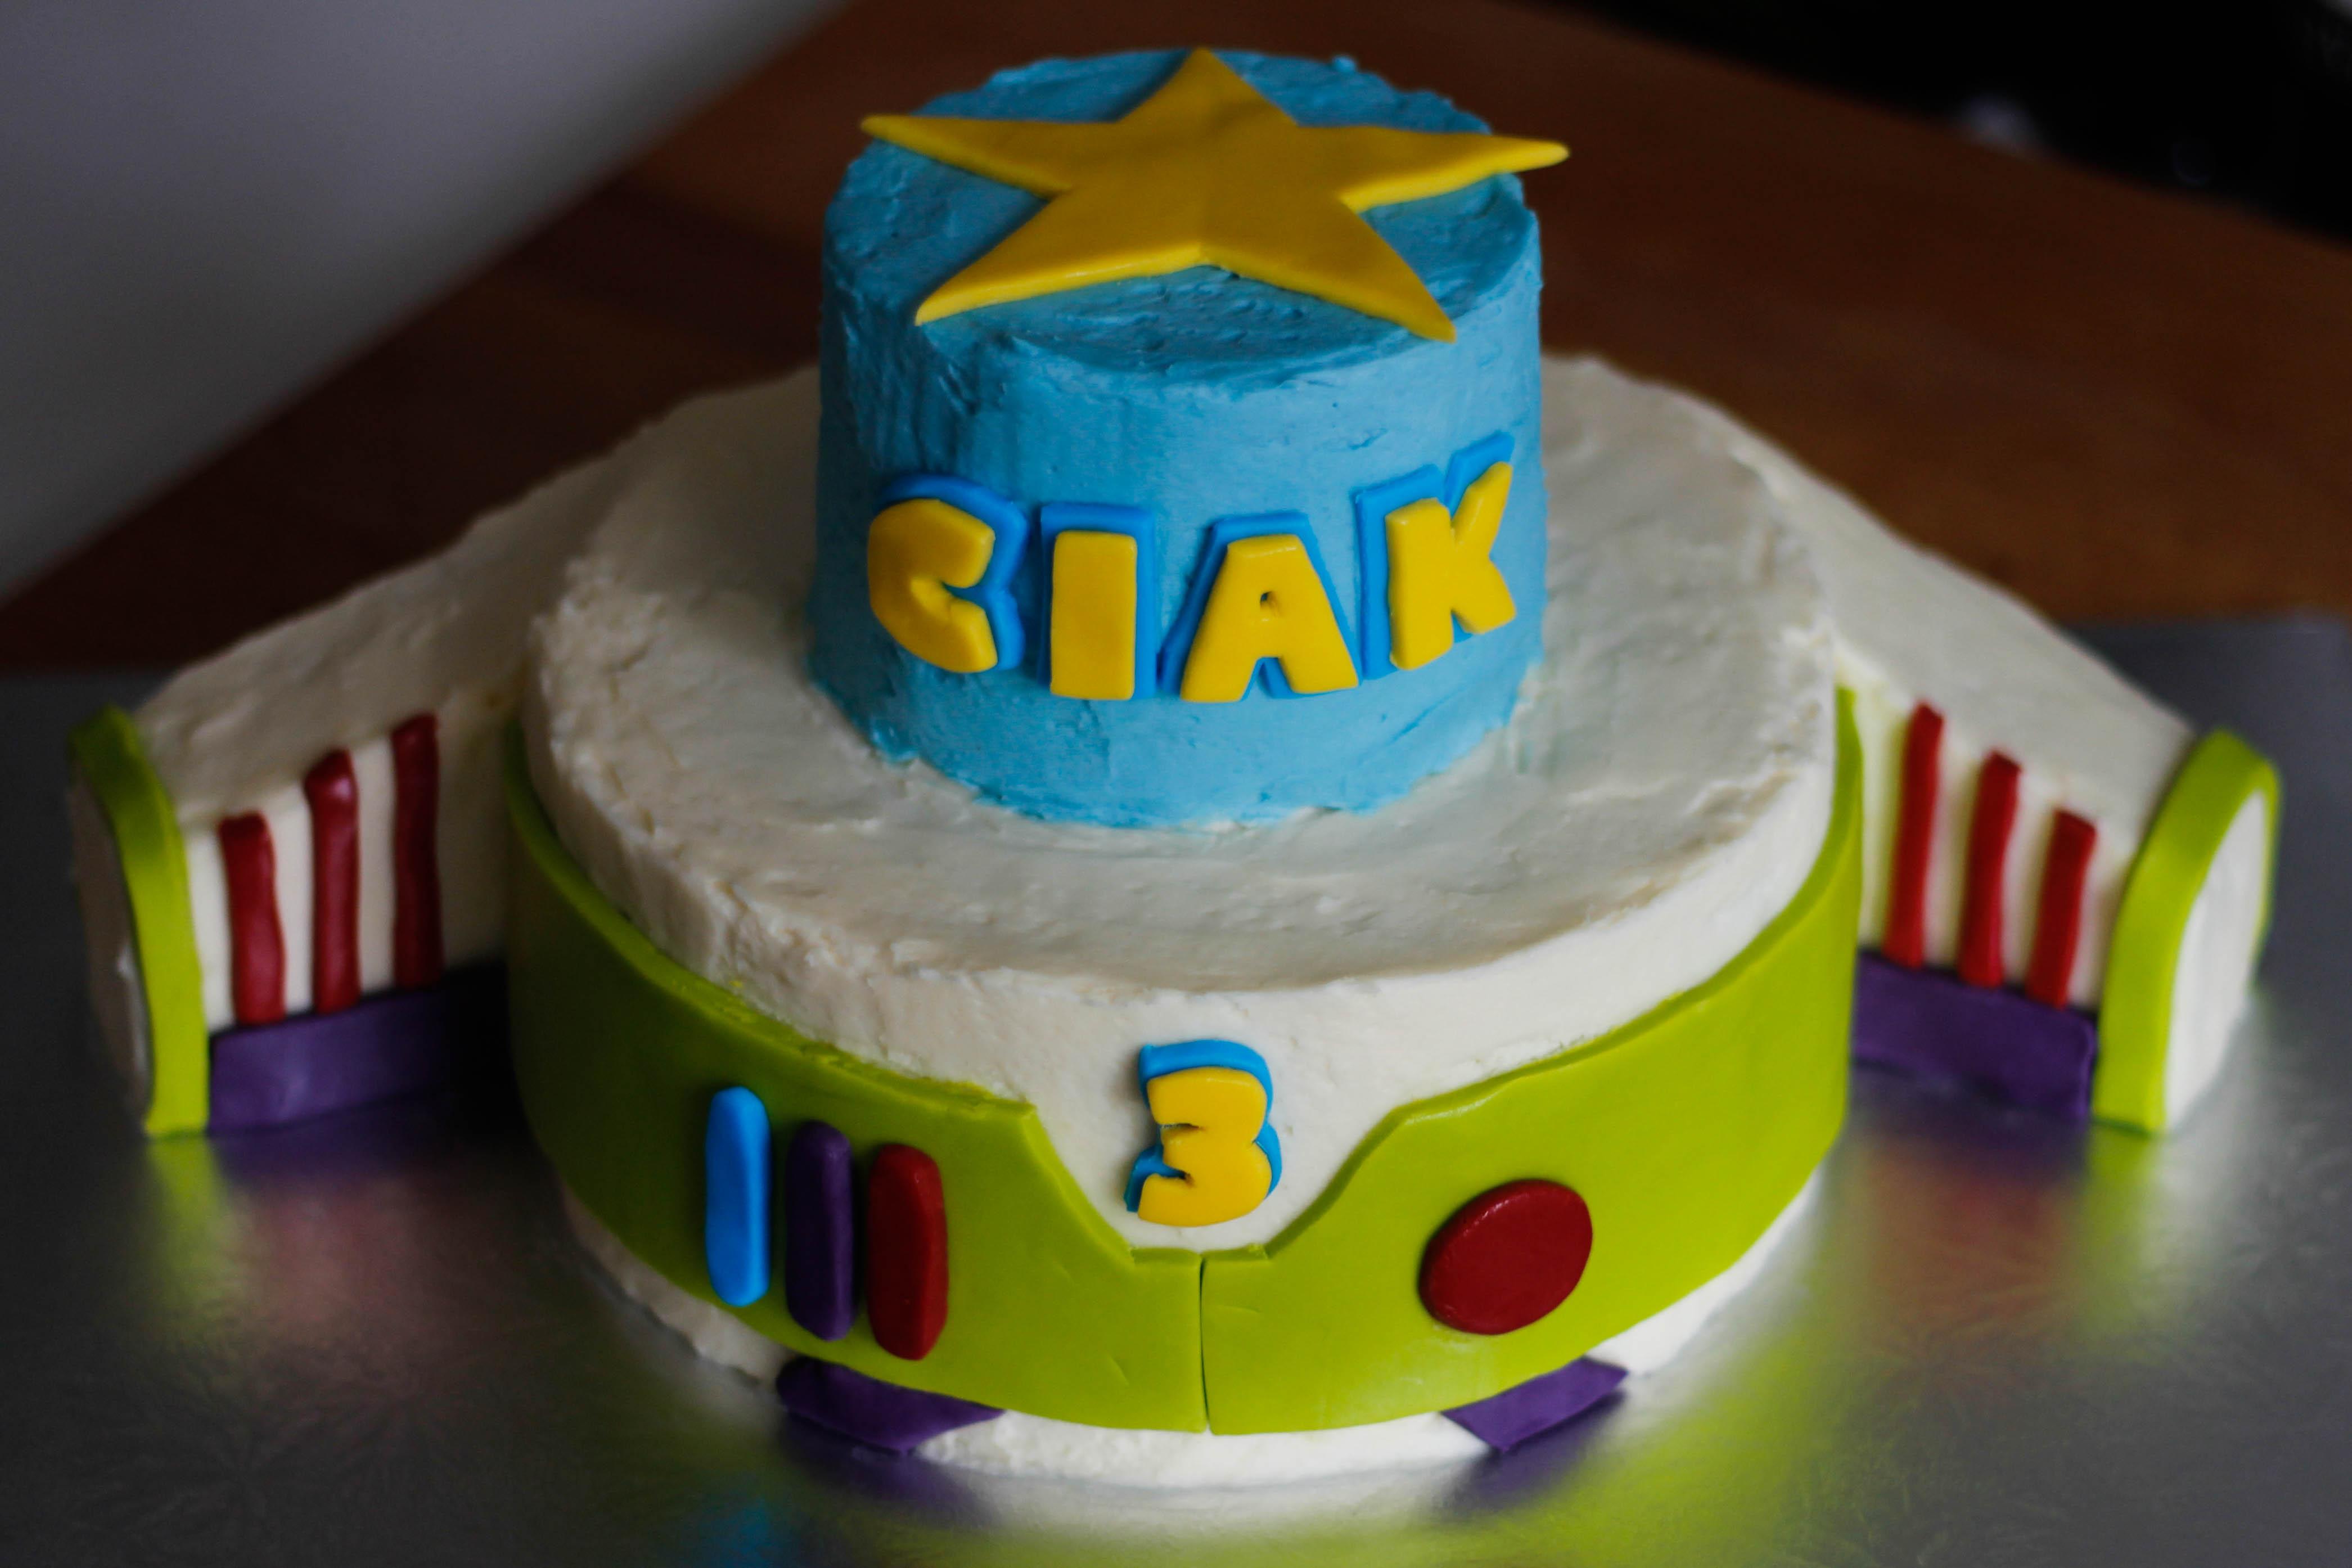 Pleasant Kids Cakes Batman Buzz Lightyear Brianas Kitchen Funny Birthday Cards Online Inifodamsfinfo